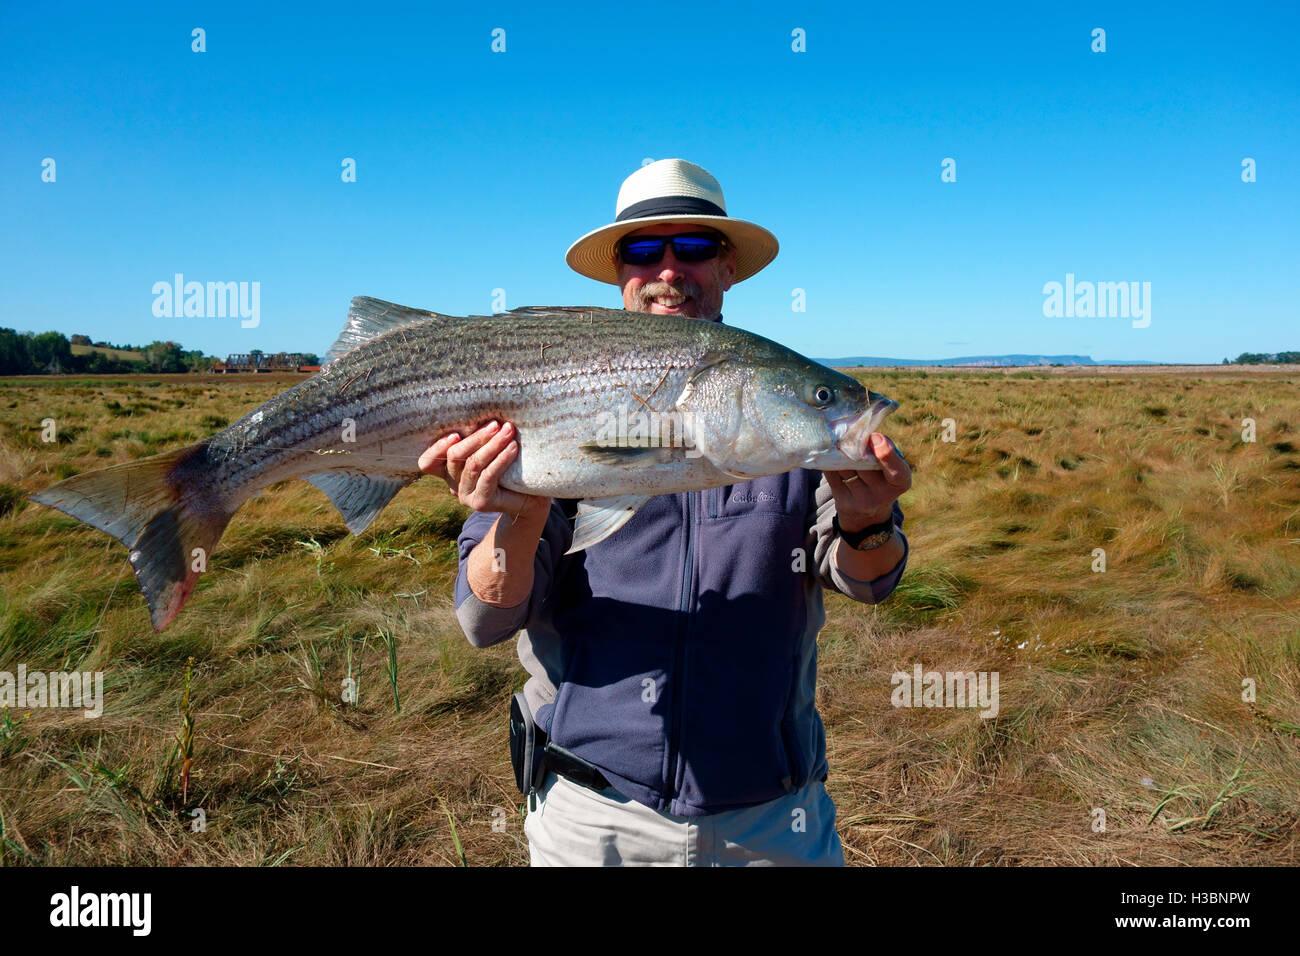 Monster Fish Stockfotos & Monster Fish Bilder - Alamy